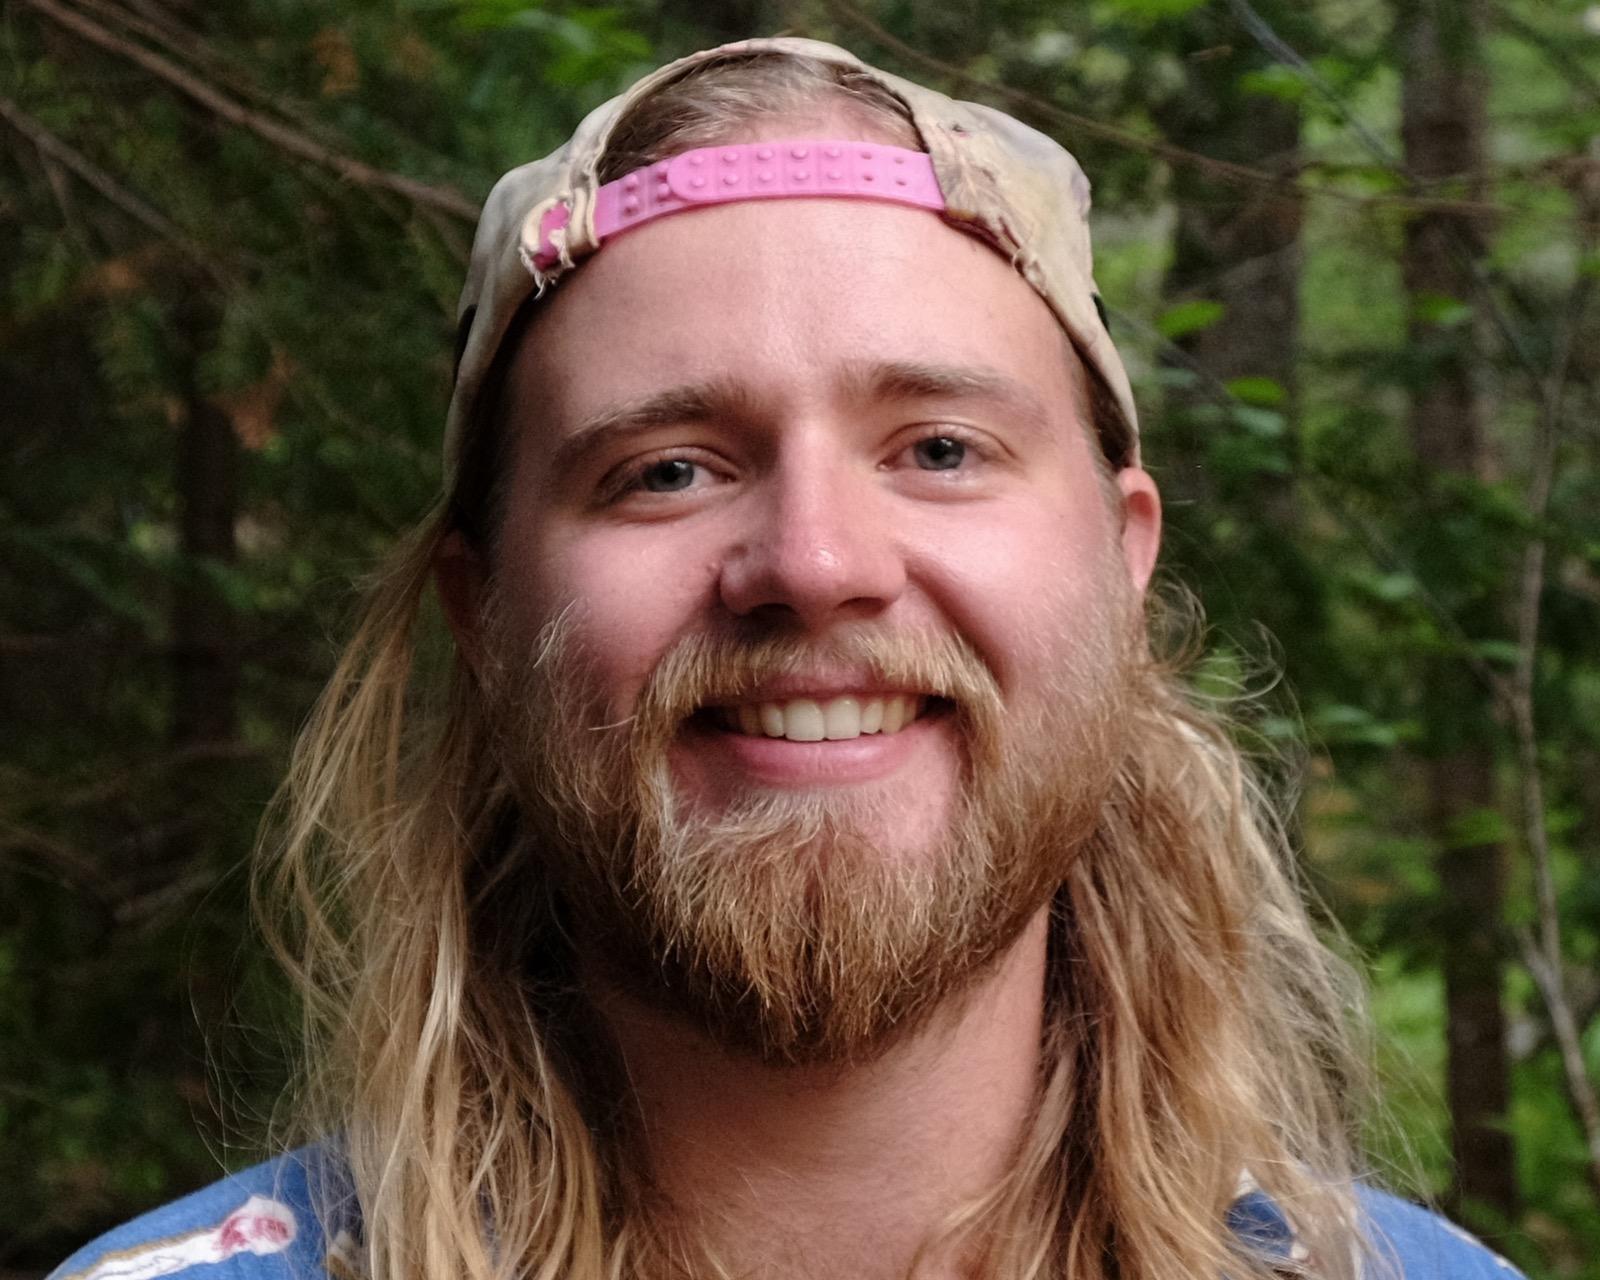 Justin Mortenson